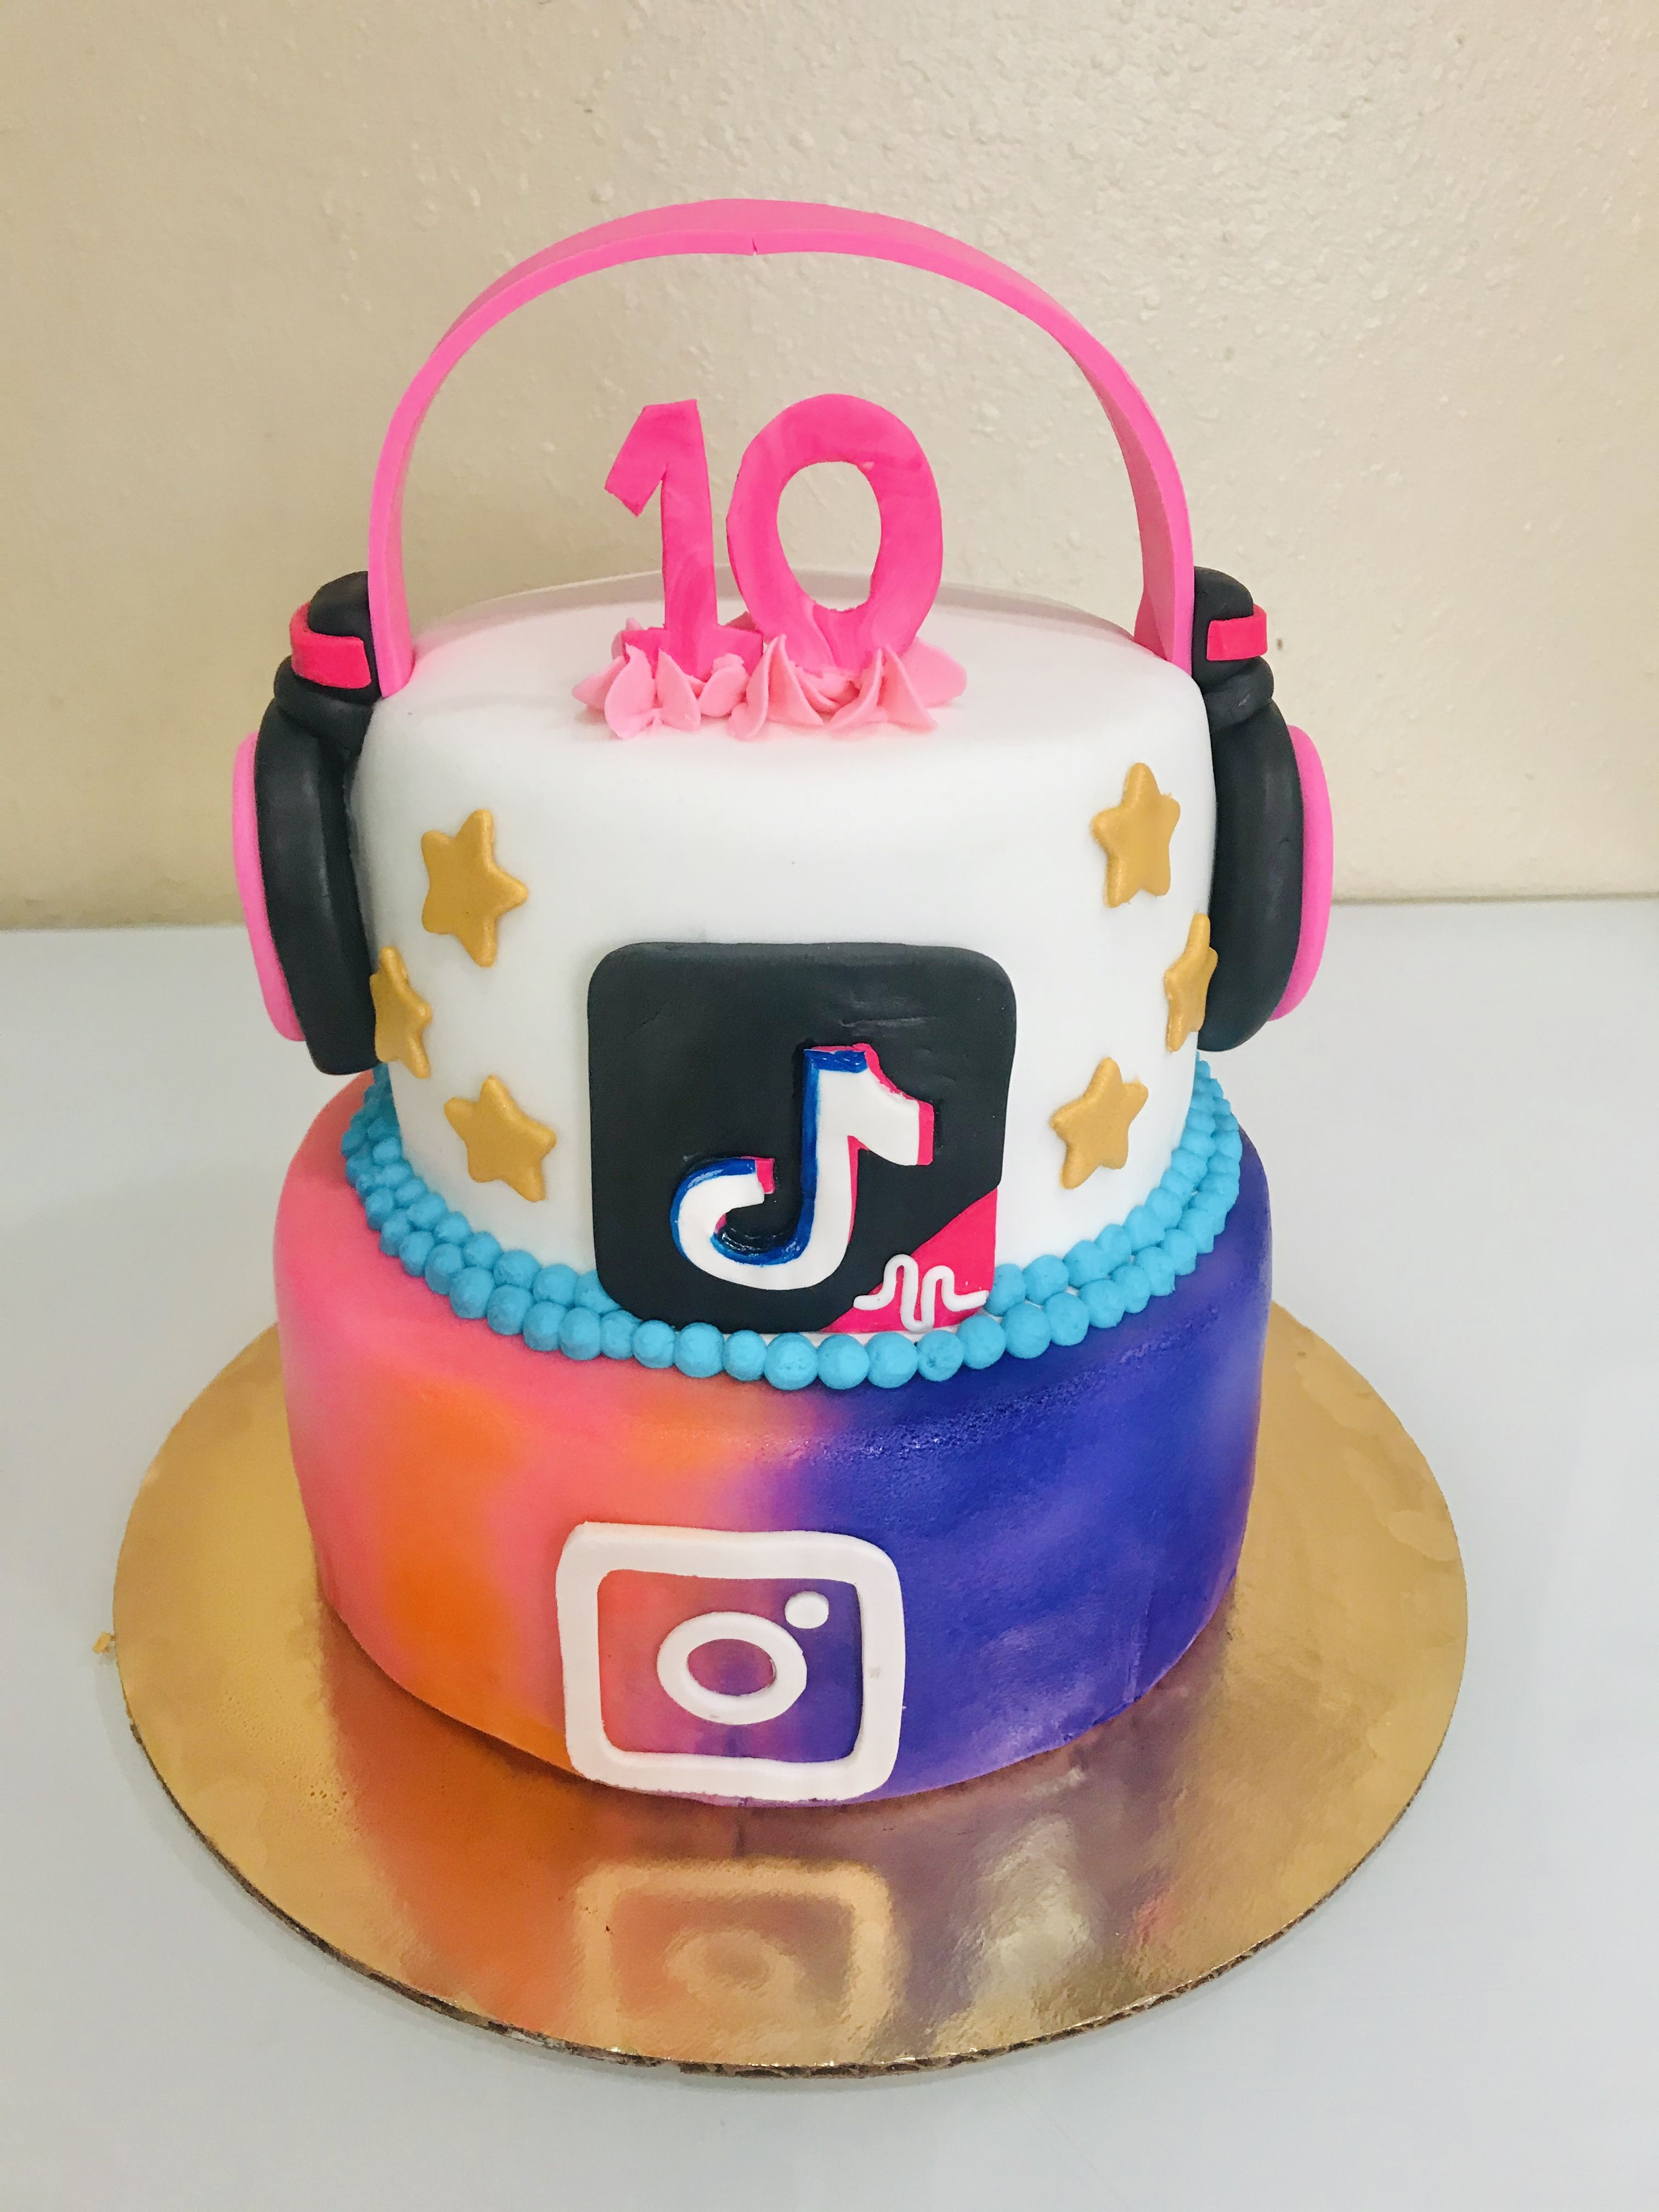 Tik Tok And Instagram Cake 14th Birthday Cakes Unique Birthday Cakes Cake